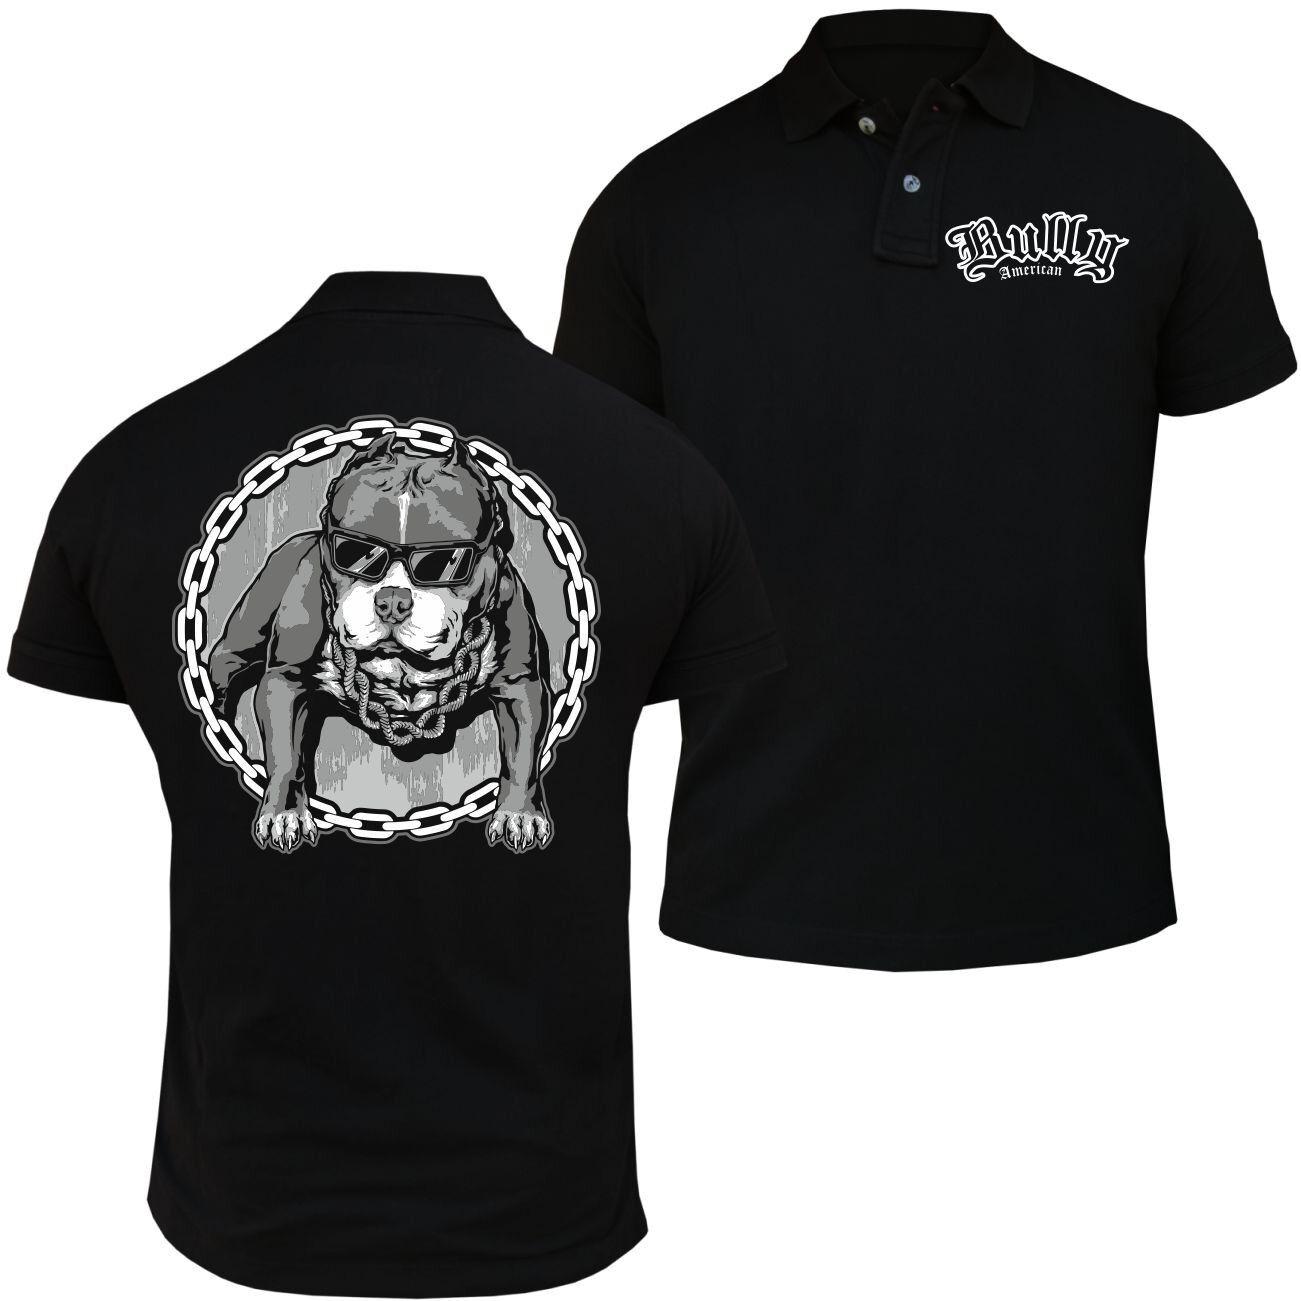 POLO Shirt American American American Bully COOL SUMMER Bulldogs Bullies Hunde Rasse Zucht Welpen  | Qualität Produkt  | Bekannt für seine gute Qualität  | Schöne Farbe  973de2